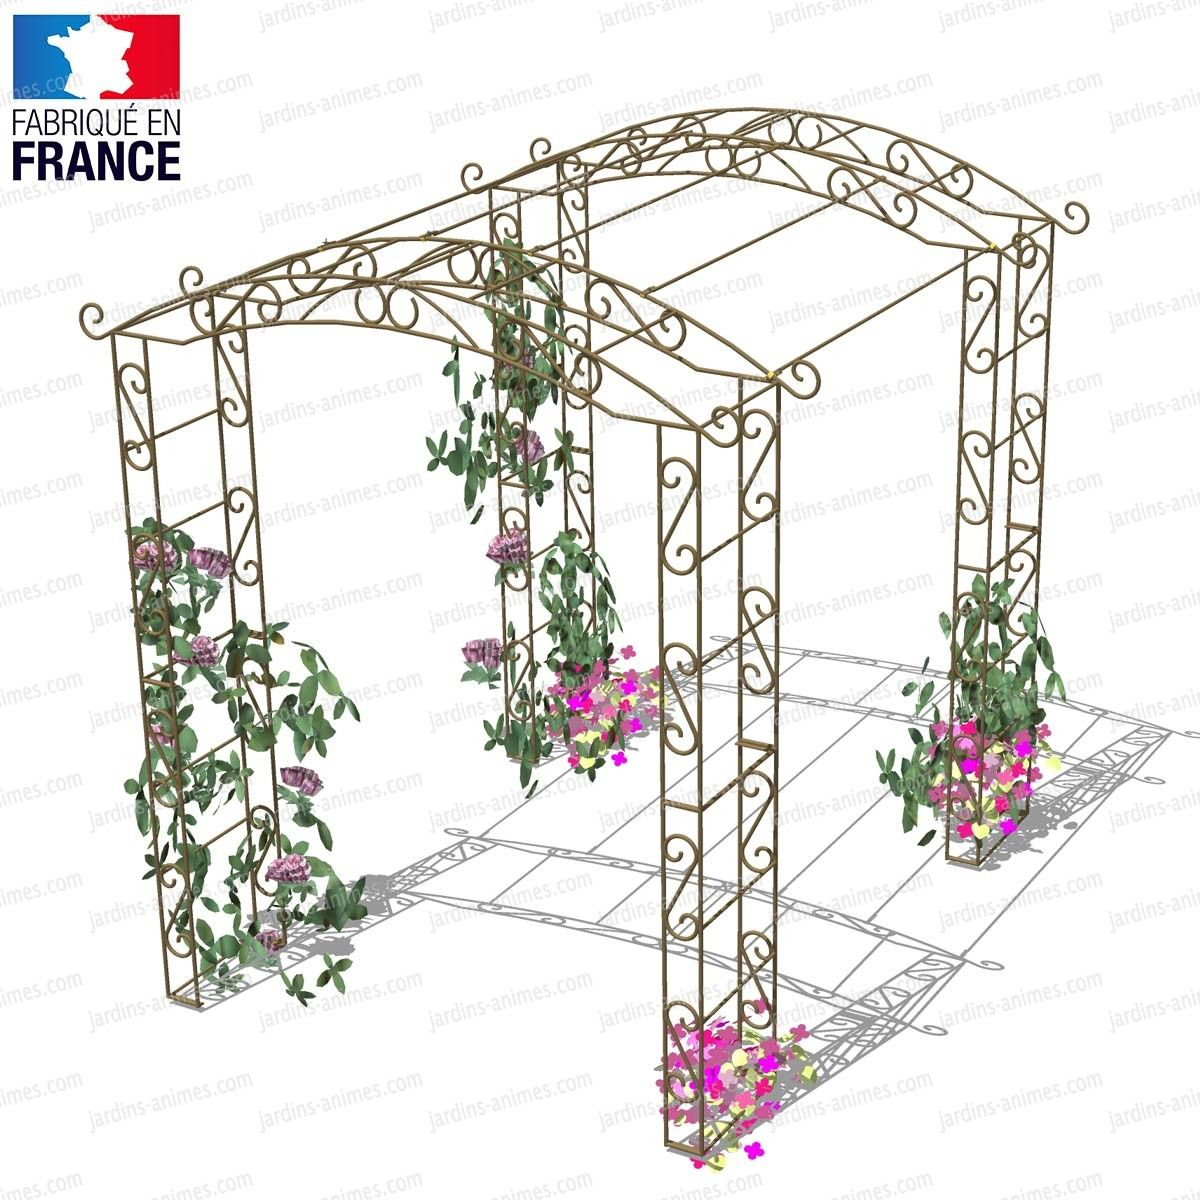 Kiosque Tonnelle En Fer 4 Pieds 4 50m2 Arche Jardin Kiosque Jardin Jardins